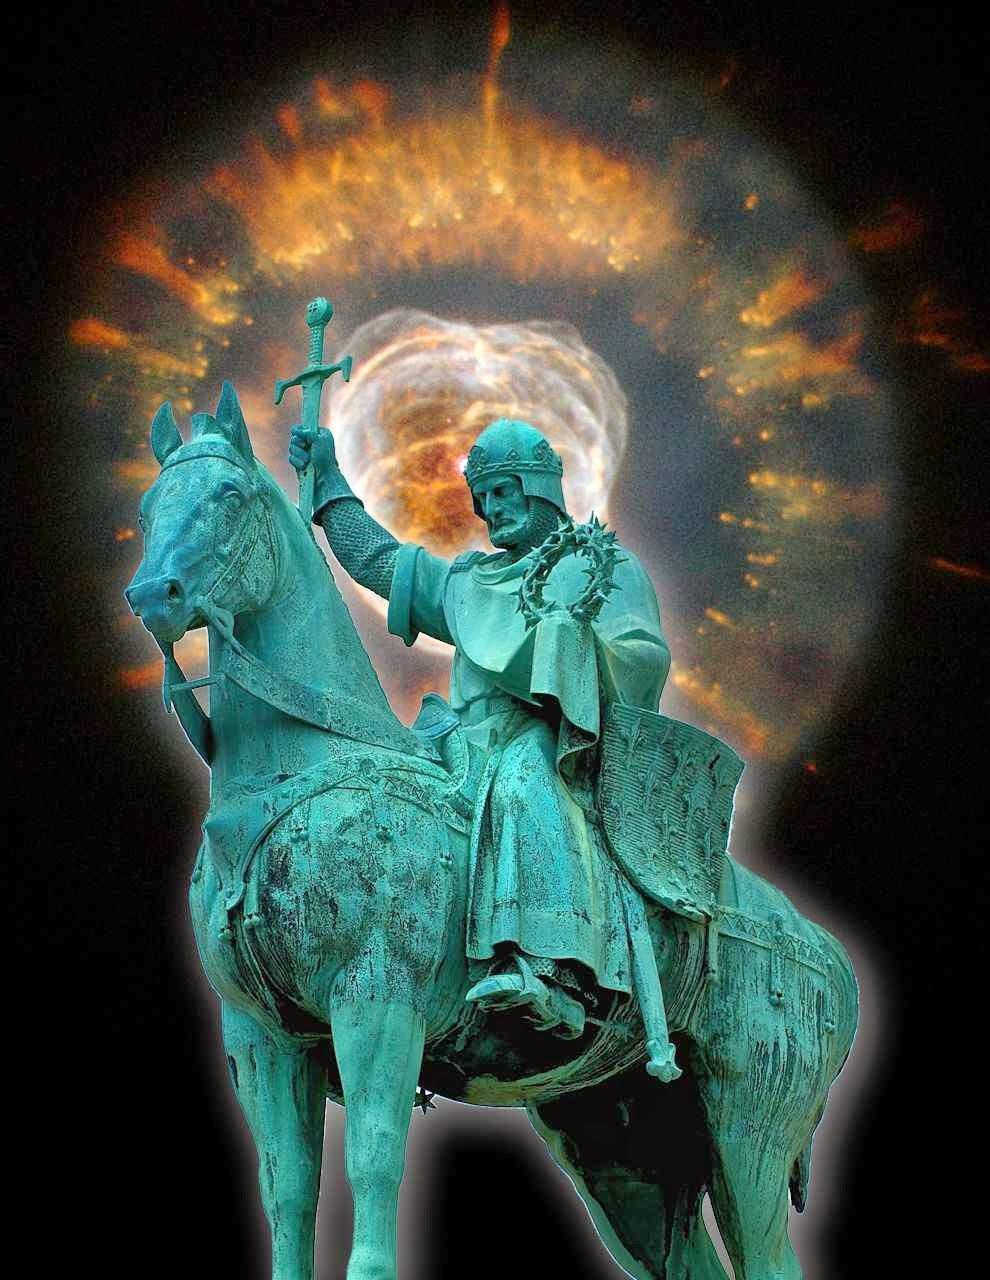 Estatua de San Luis en la basílica de Montmartre, Paris  Fondo: Eskimo Nebula, NGC 2392, Hubble Space Telescope